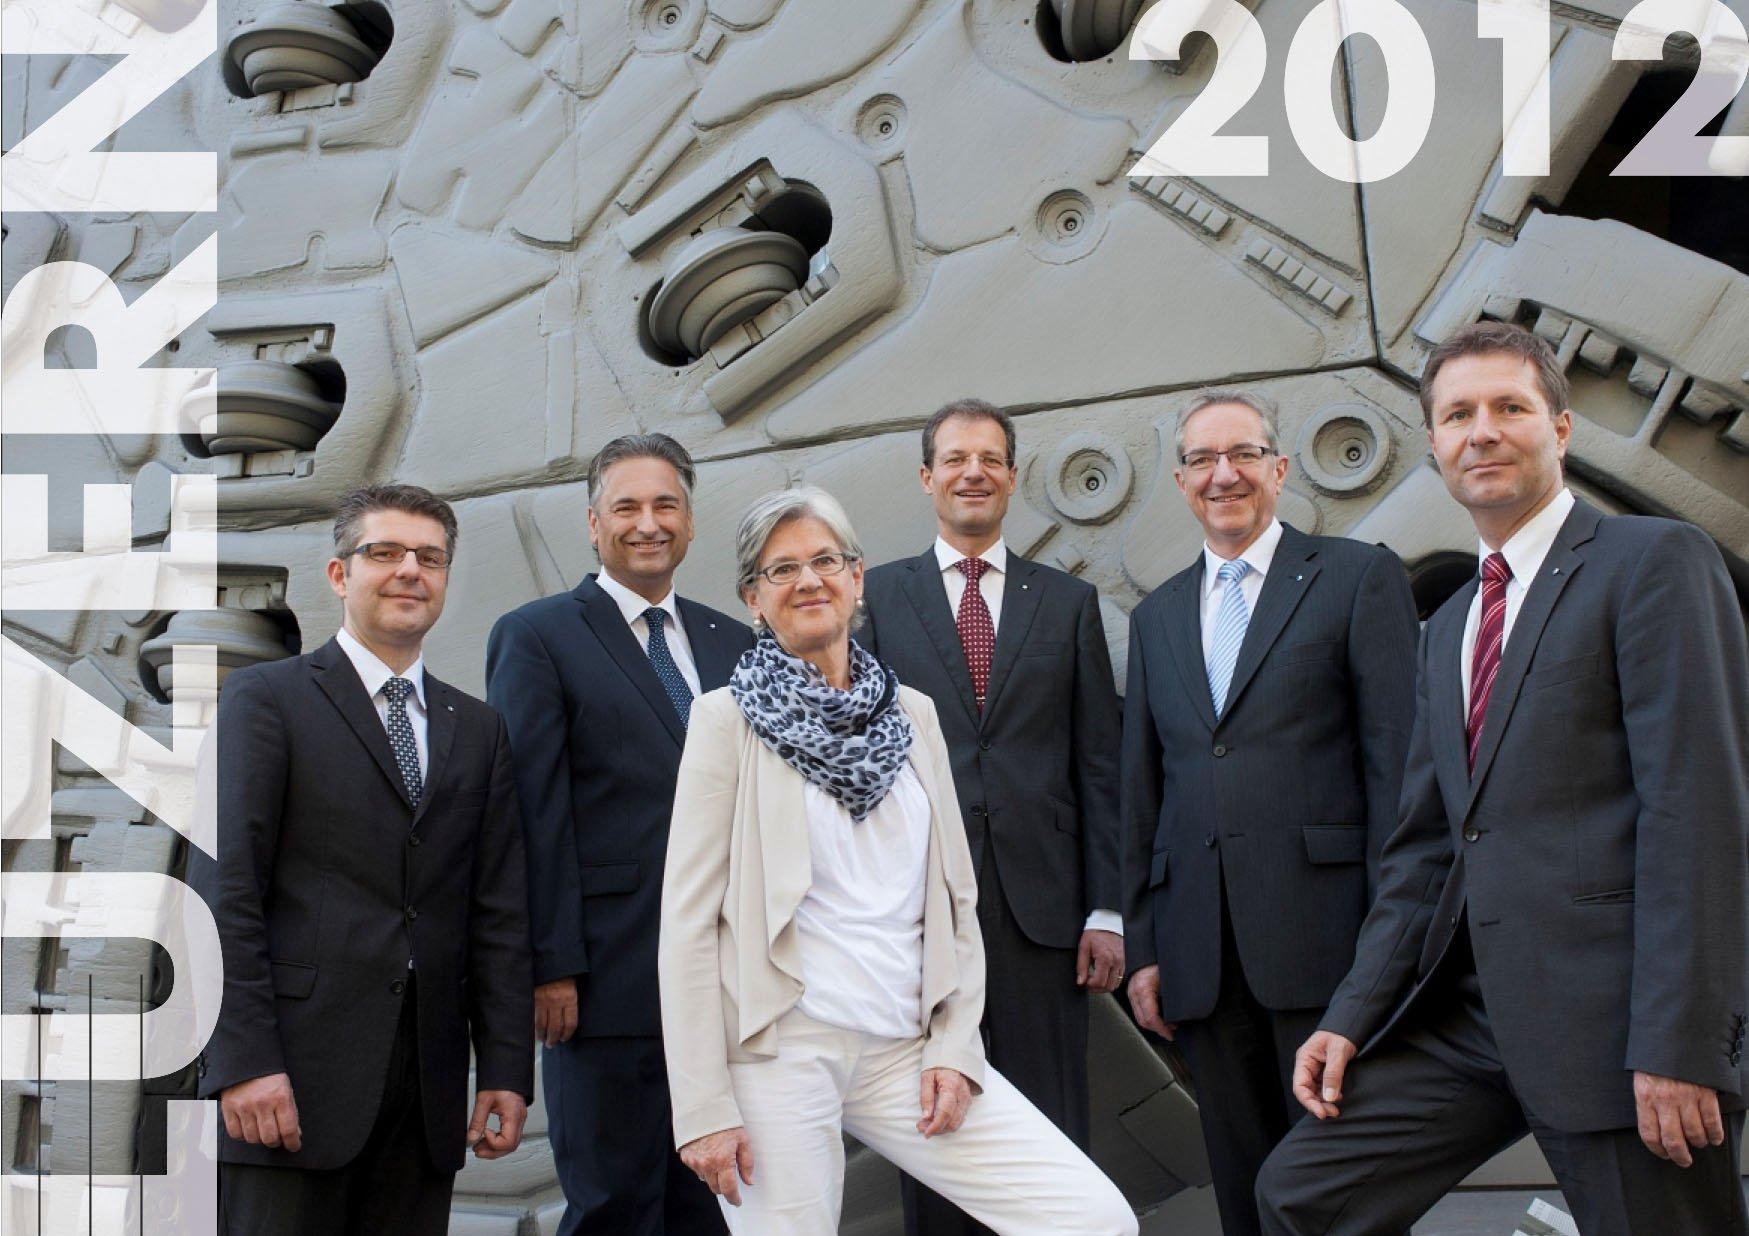 Foto 2012: (v.l.) Staatsschreiber Lukas Gresch-Brunner. Rechts die Regierung: Guido Graf (CVP), Yvonne Schärli-Gerig (SP), Reto Wyss (CVP), Robert Küng (FDP), Marcel Schwerzmann (pl).